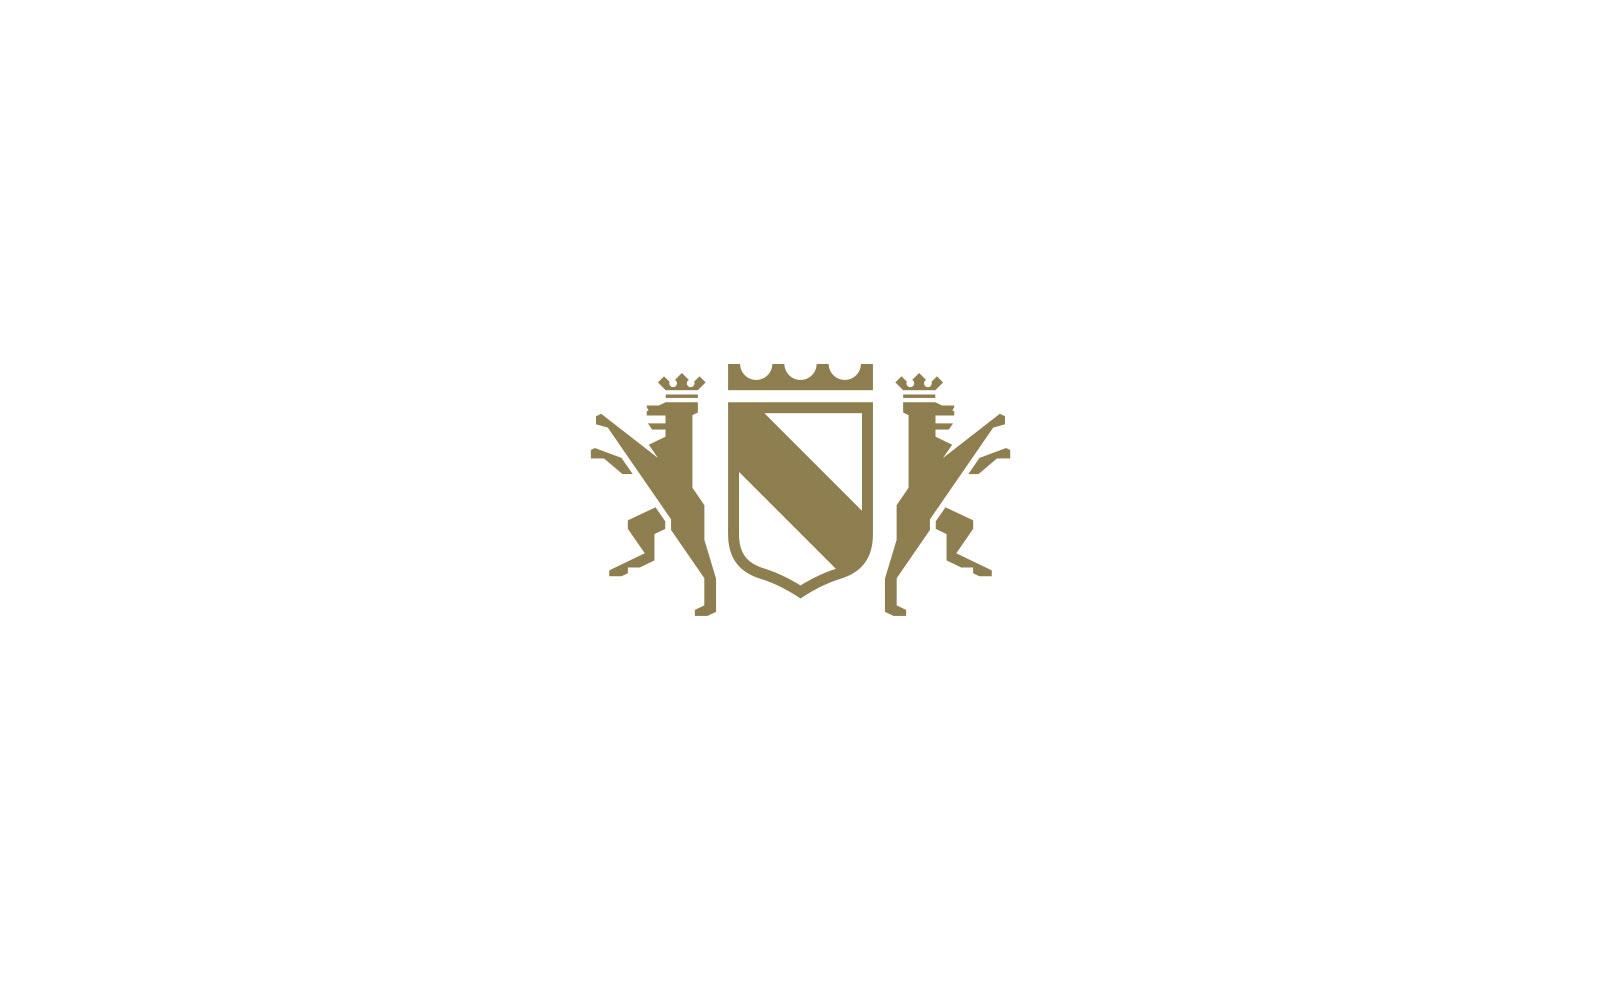 mcleod_1600p_logo_2